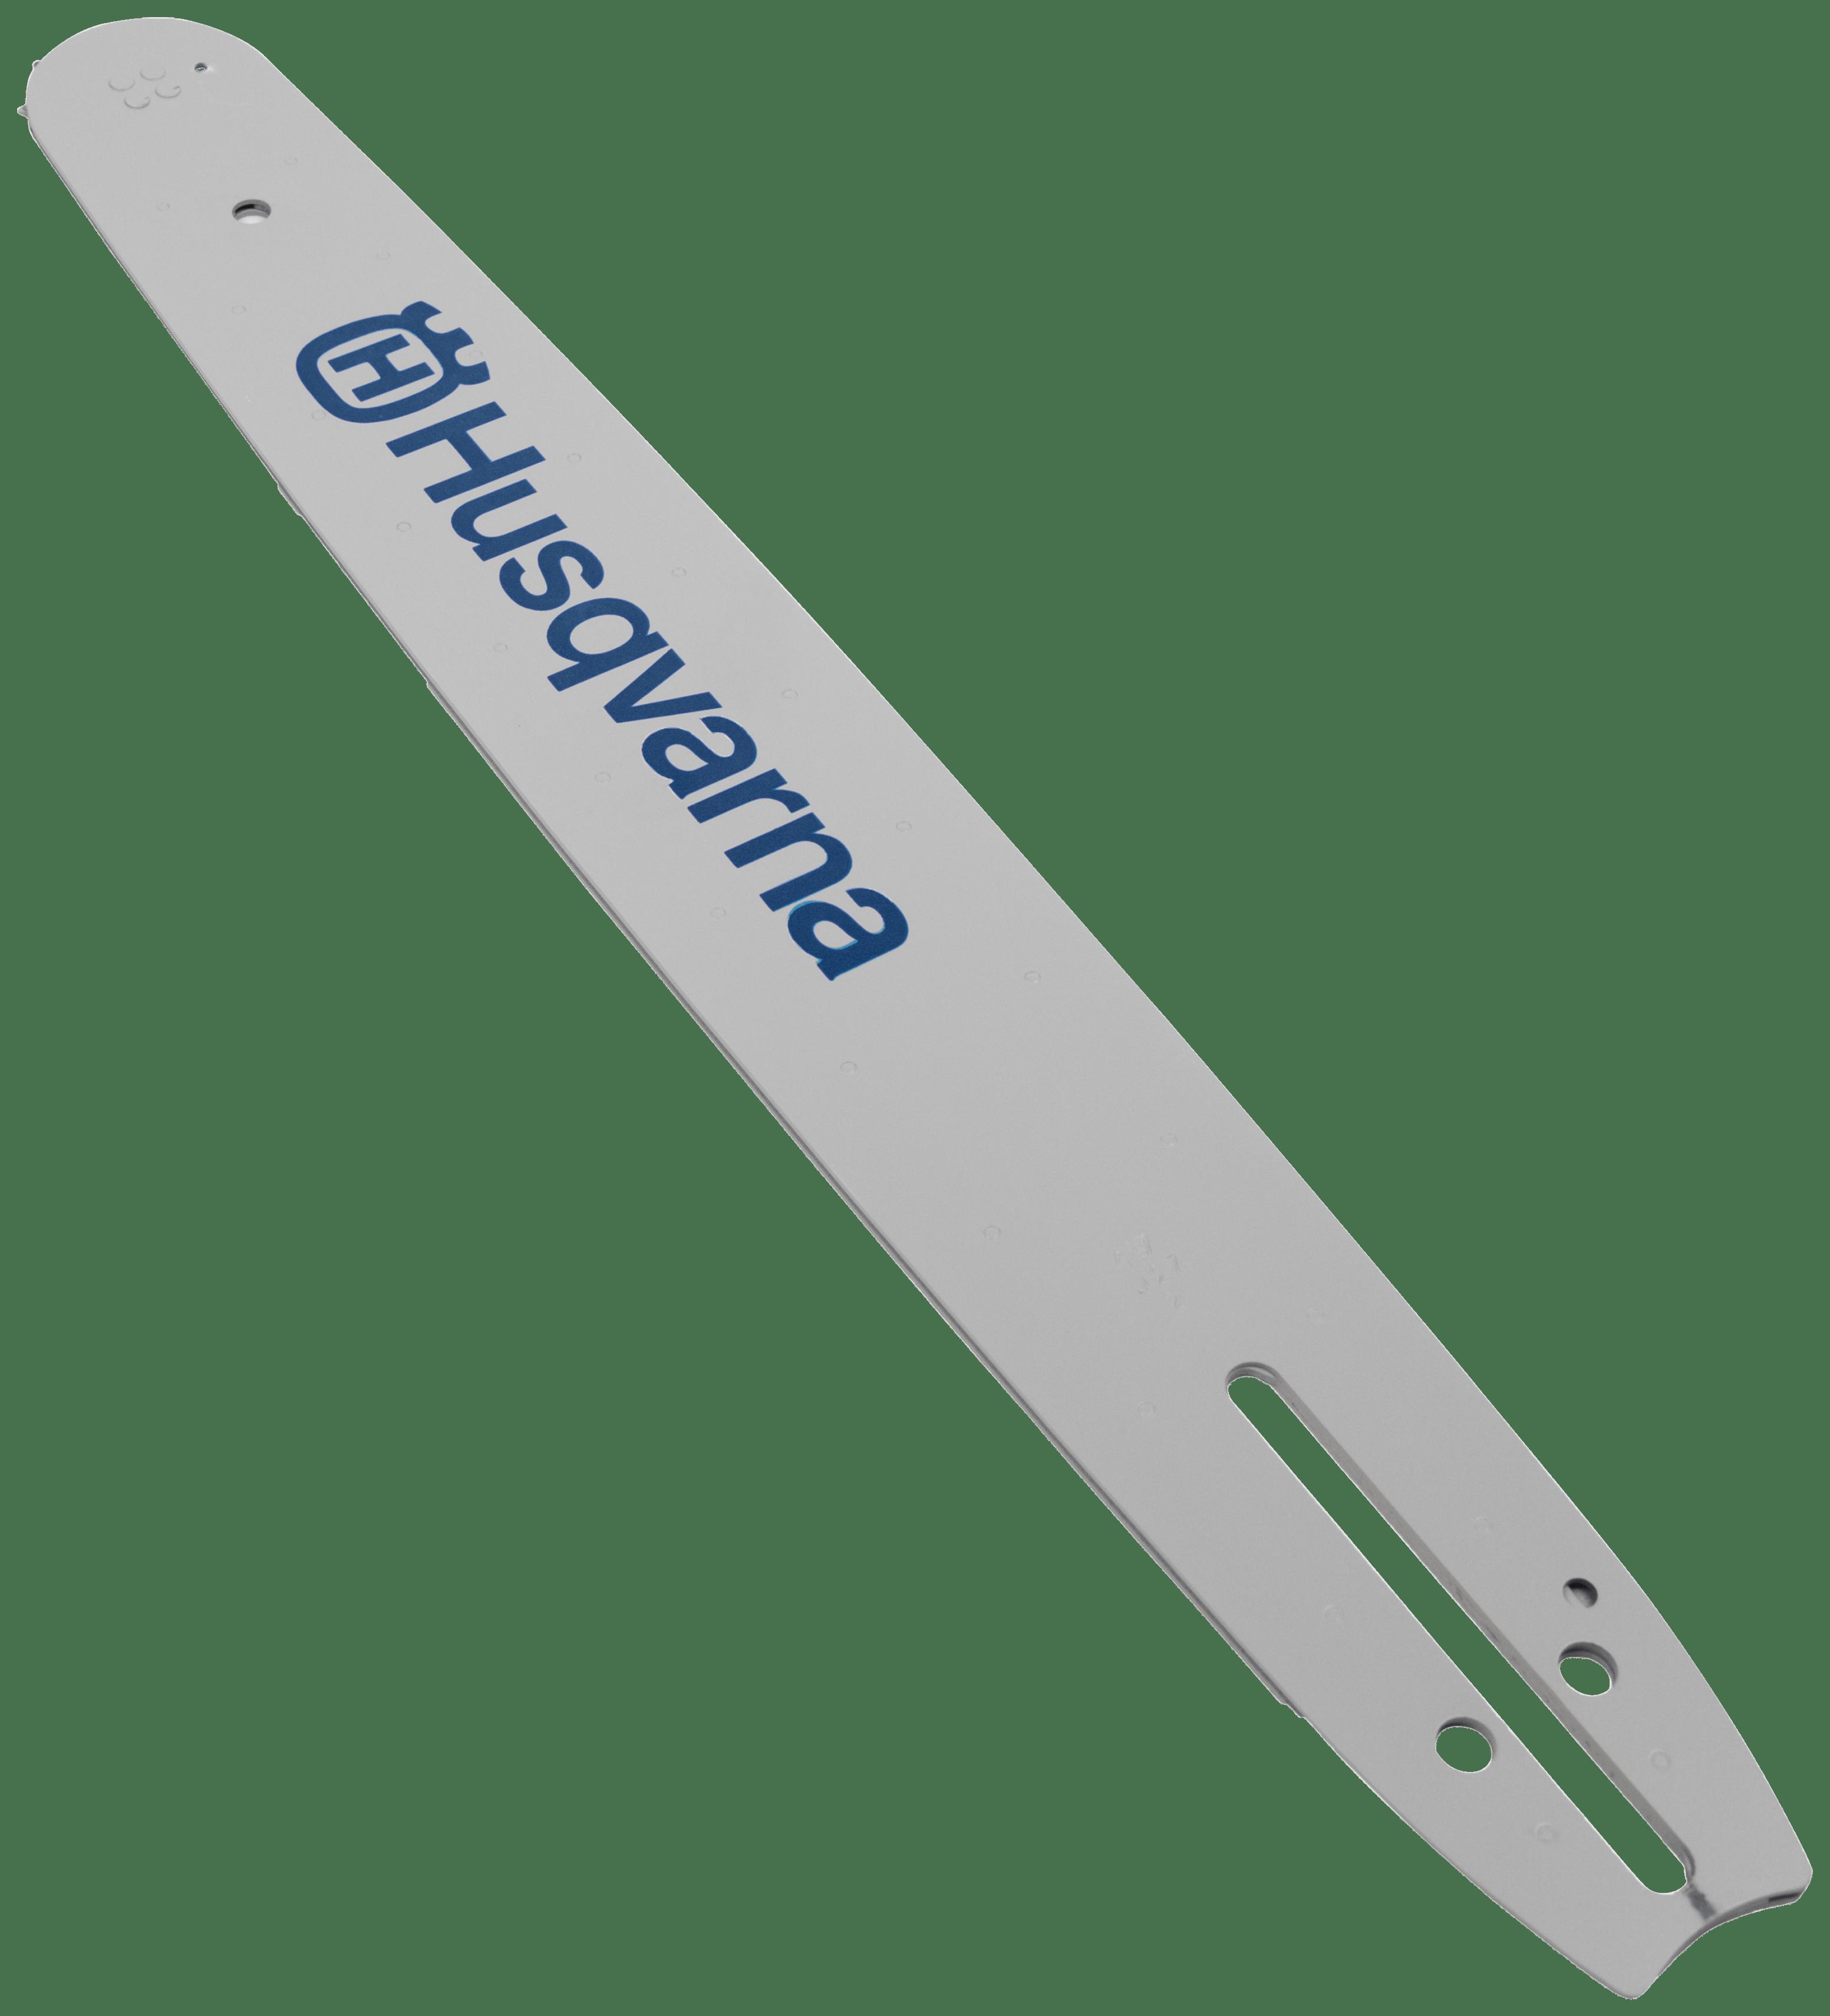 HLN 250-80 20 Husqvarna Guide Bar